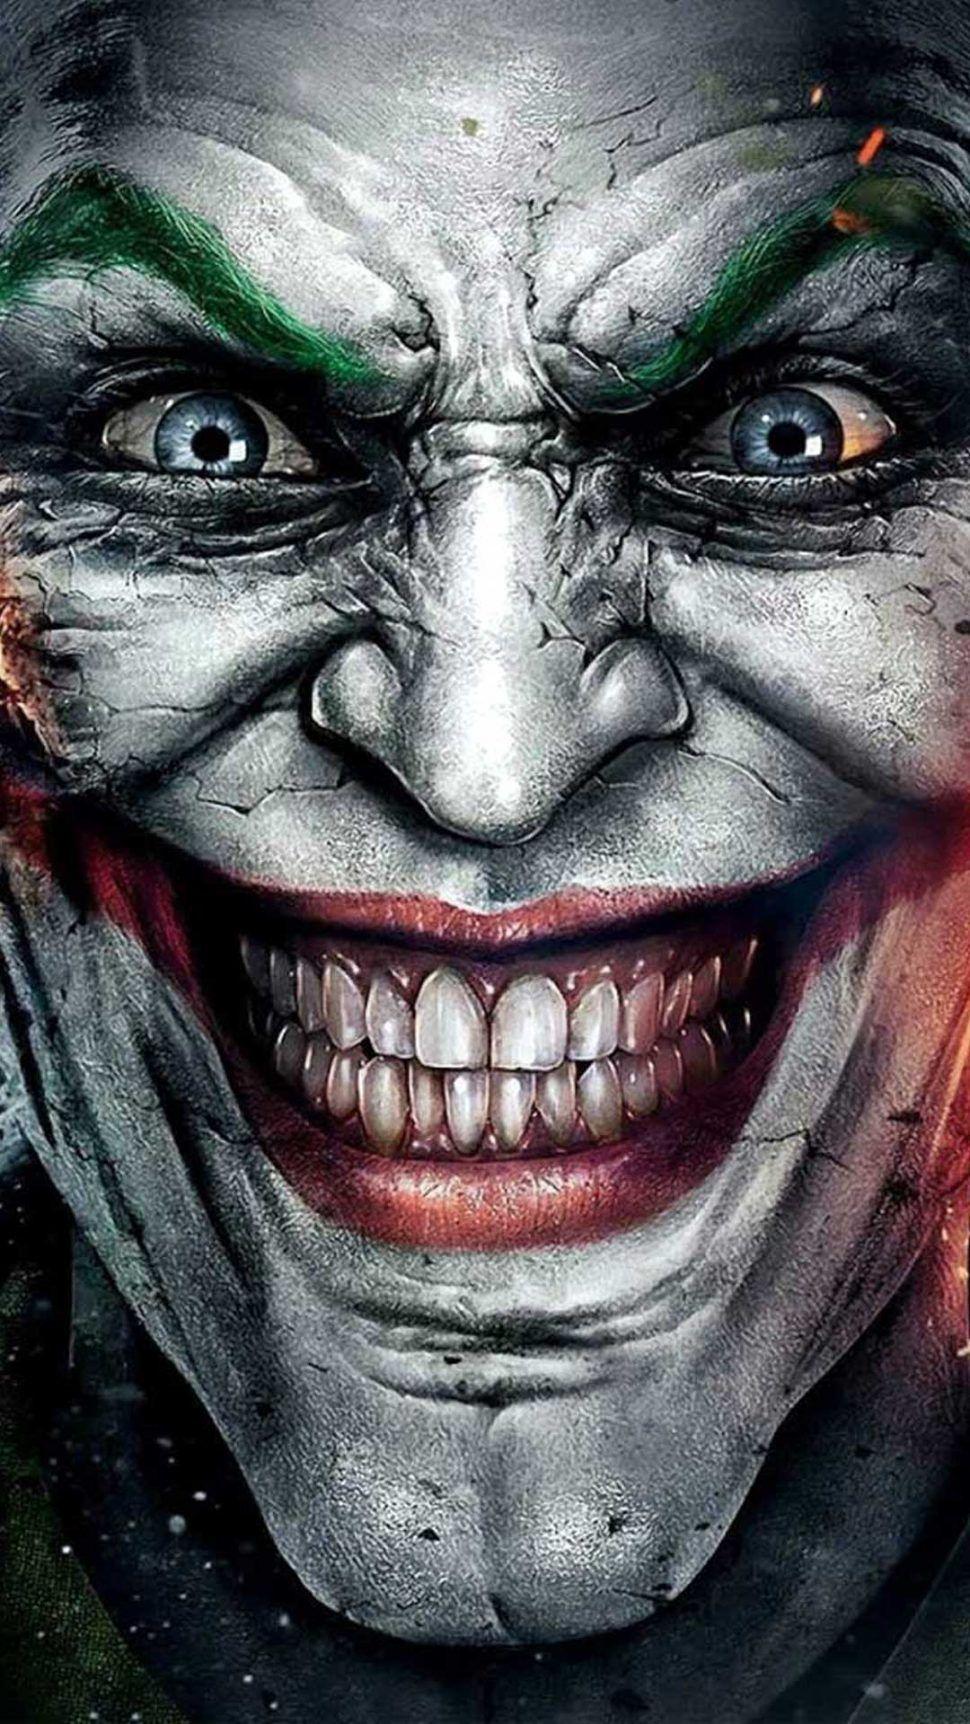 Iphone Wallpaper Free Download 3d Pictures H5dkmw Hd Redsmith Top In 2020 Joker Hd Wallpaper Iphone Wallpaper Joker